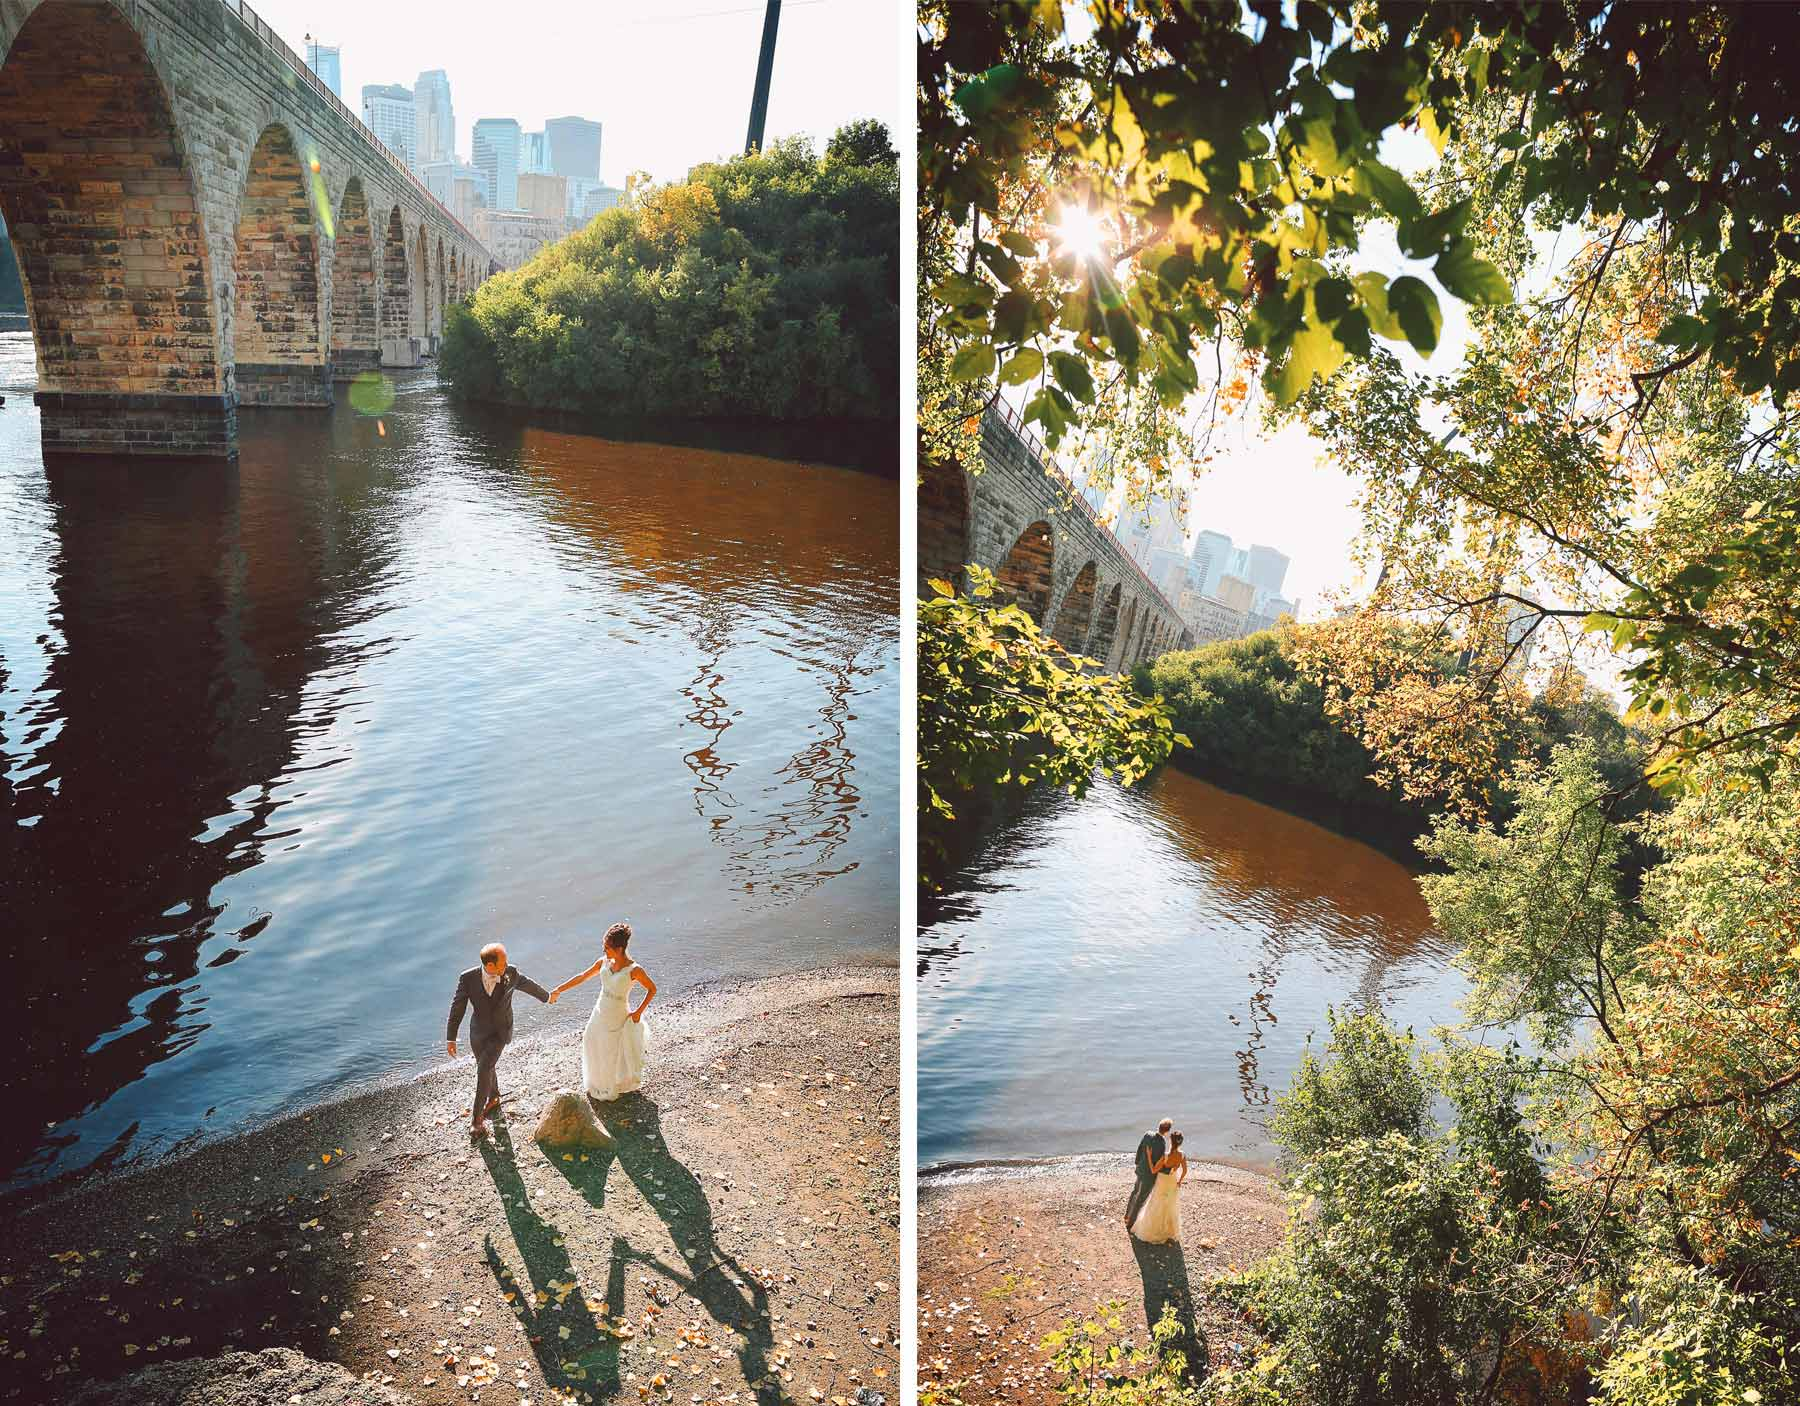 18-Minneapolis-Minnesota-Wedding-Photographer-by-Andrew-Vick-Photography-Fall-Autumn-Bride-Groom-Stone-Arch-Bridge-Mississippi-River-Vintage-Paula-and-Jason.jpg